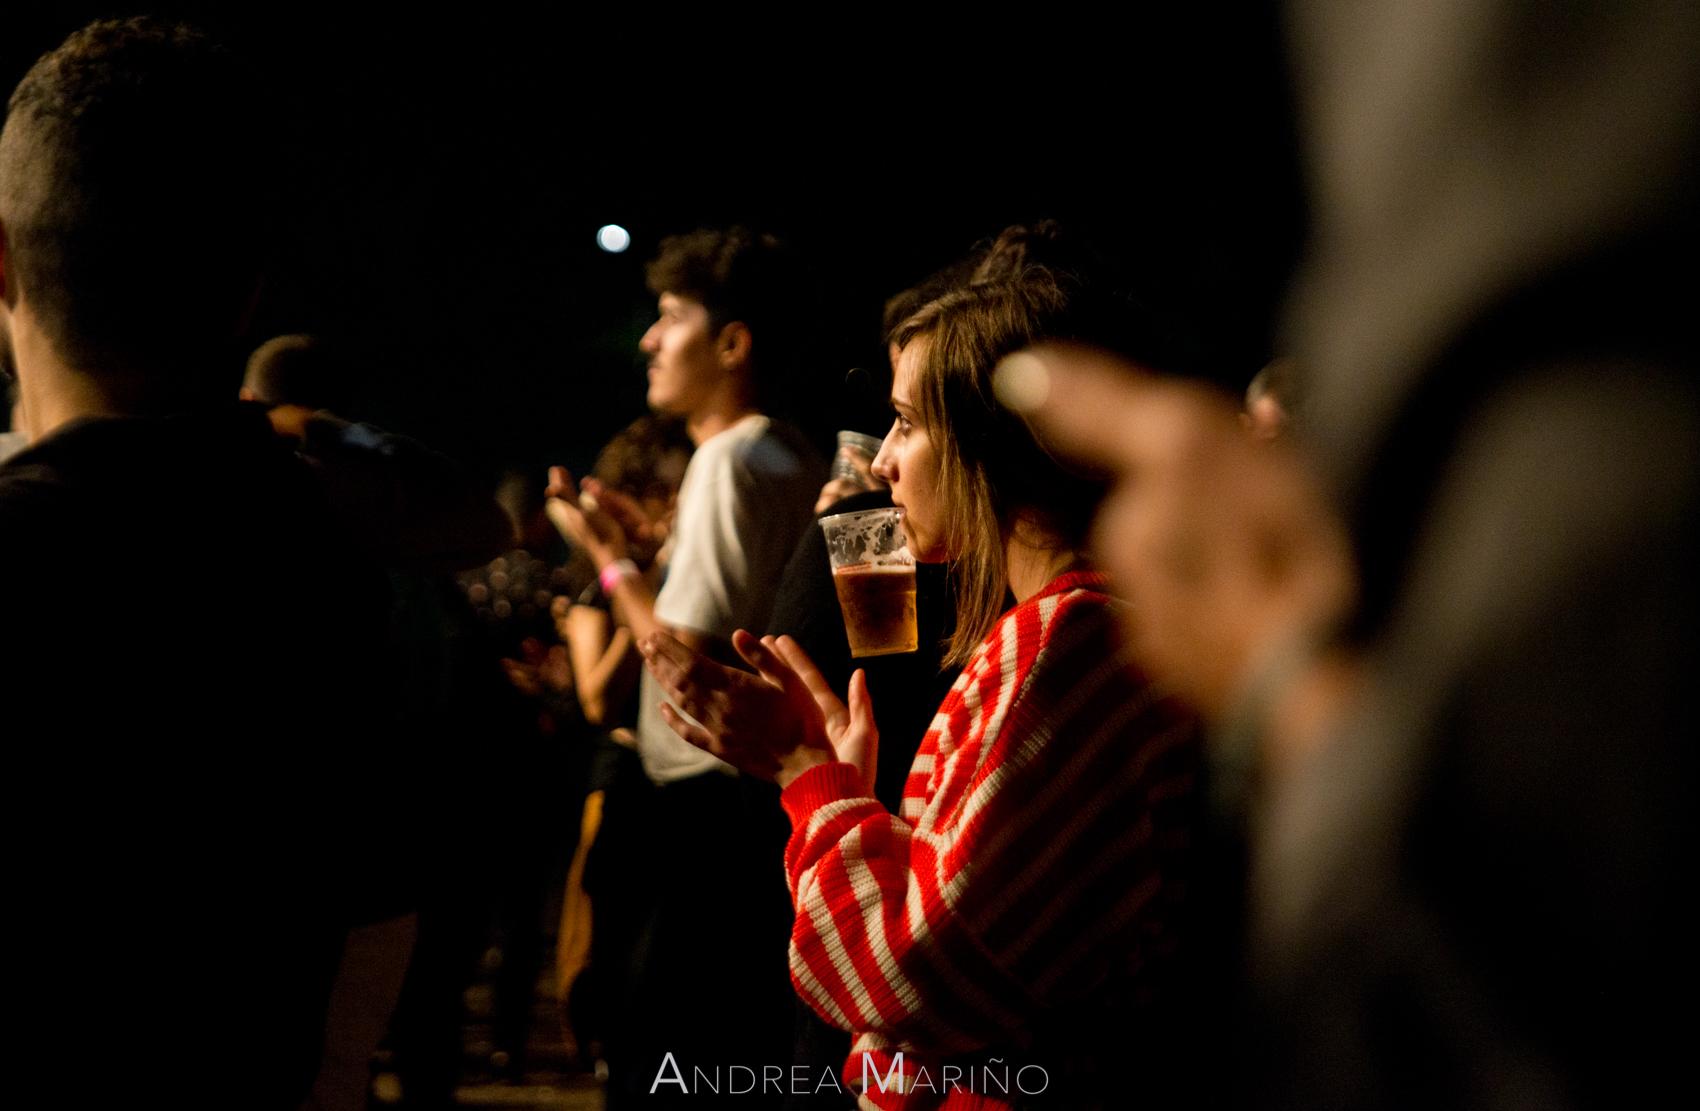 Público. Vive Nigrán. Nigrán. 20/7/18